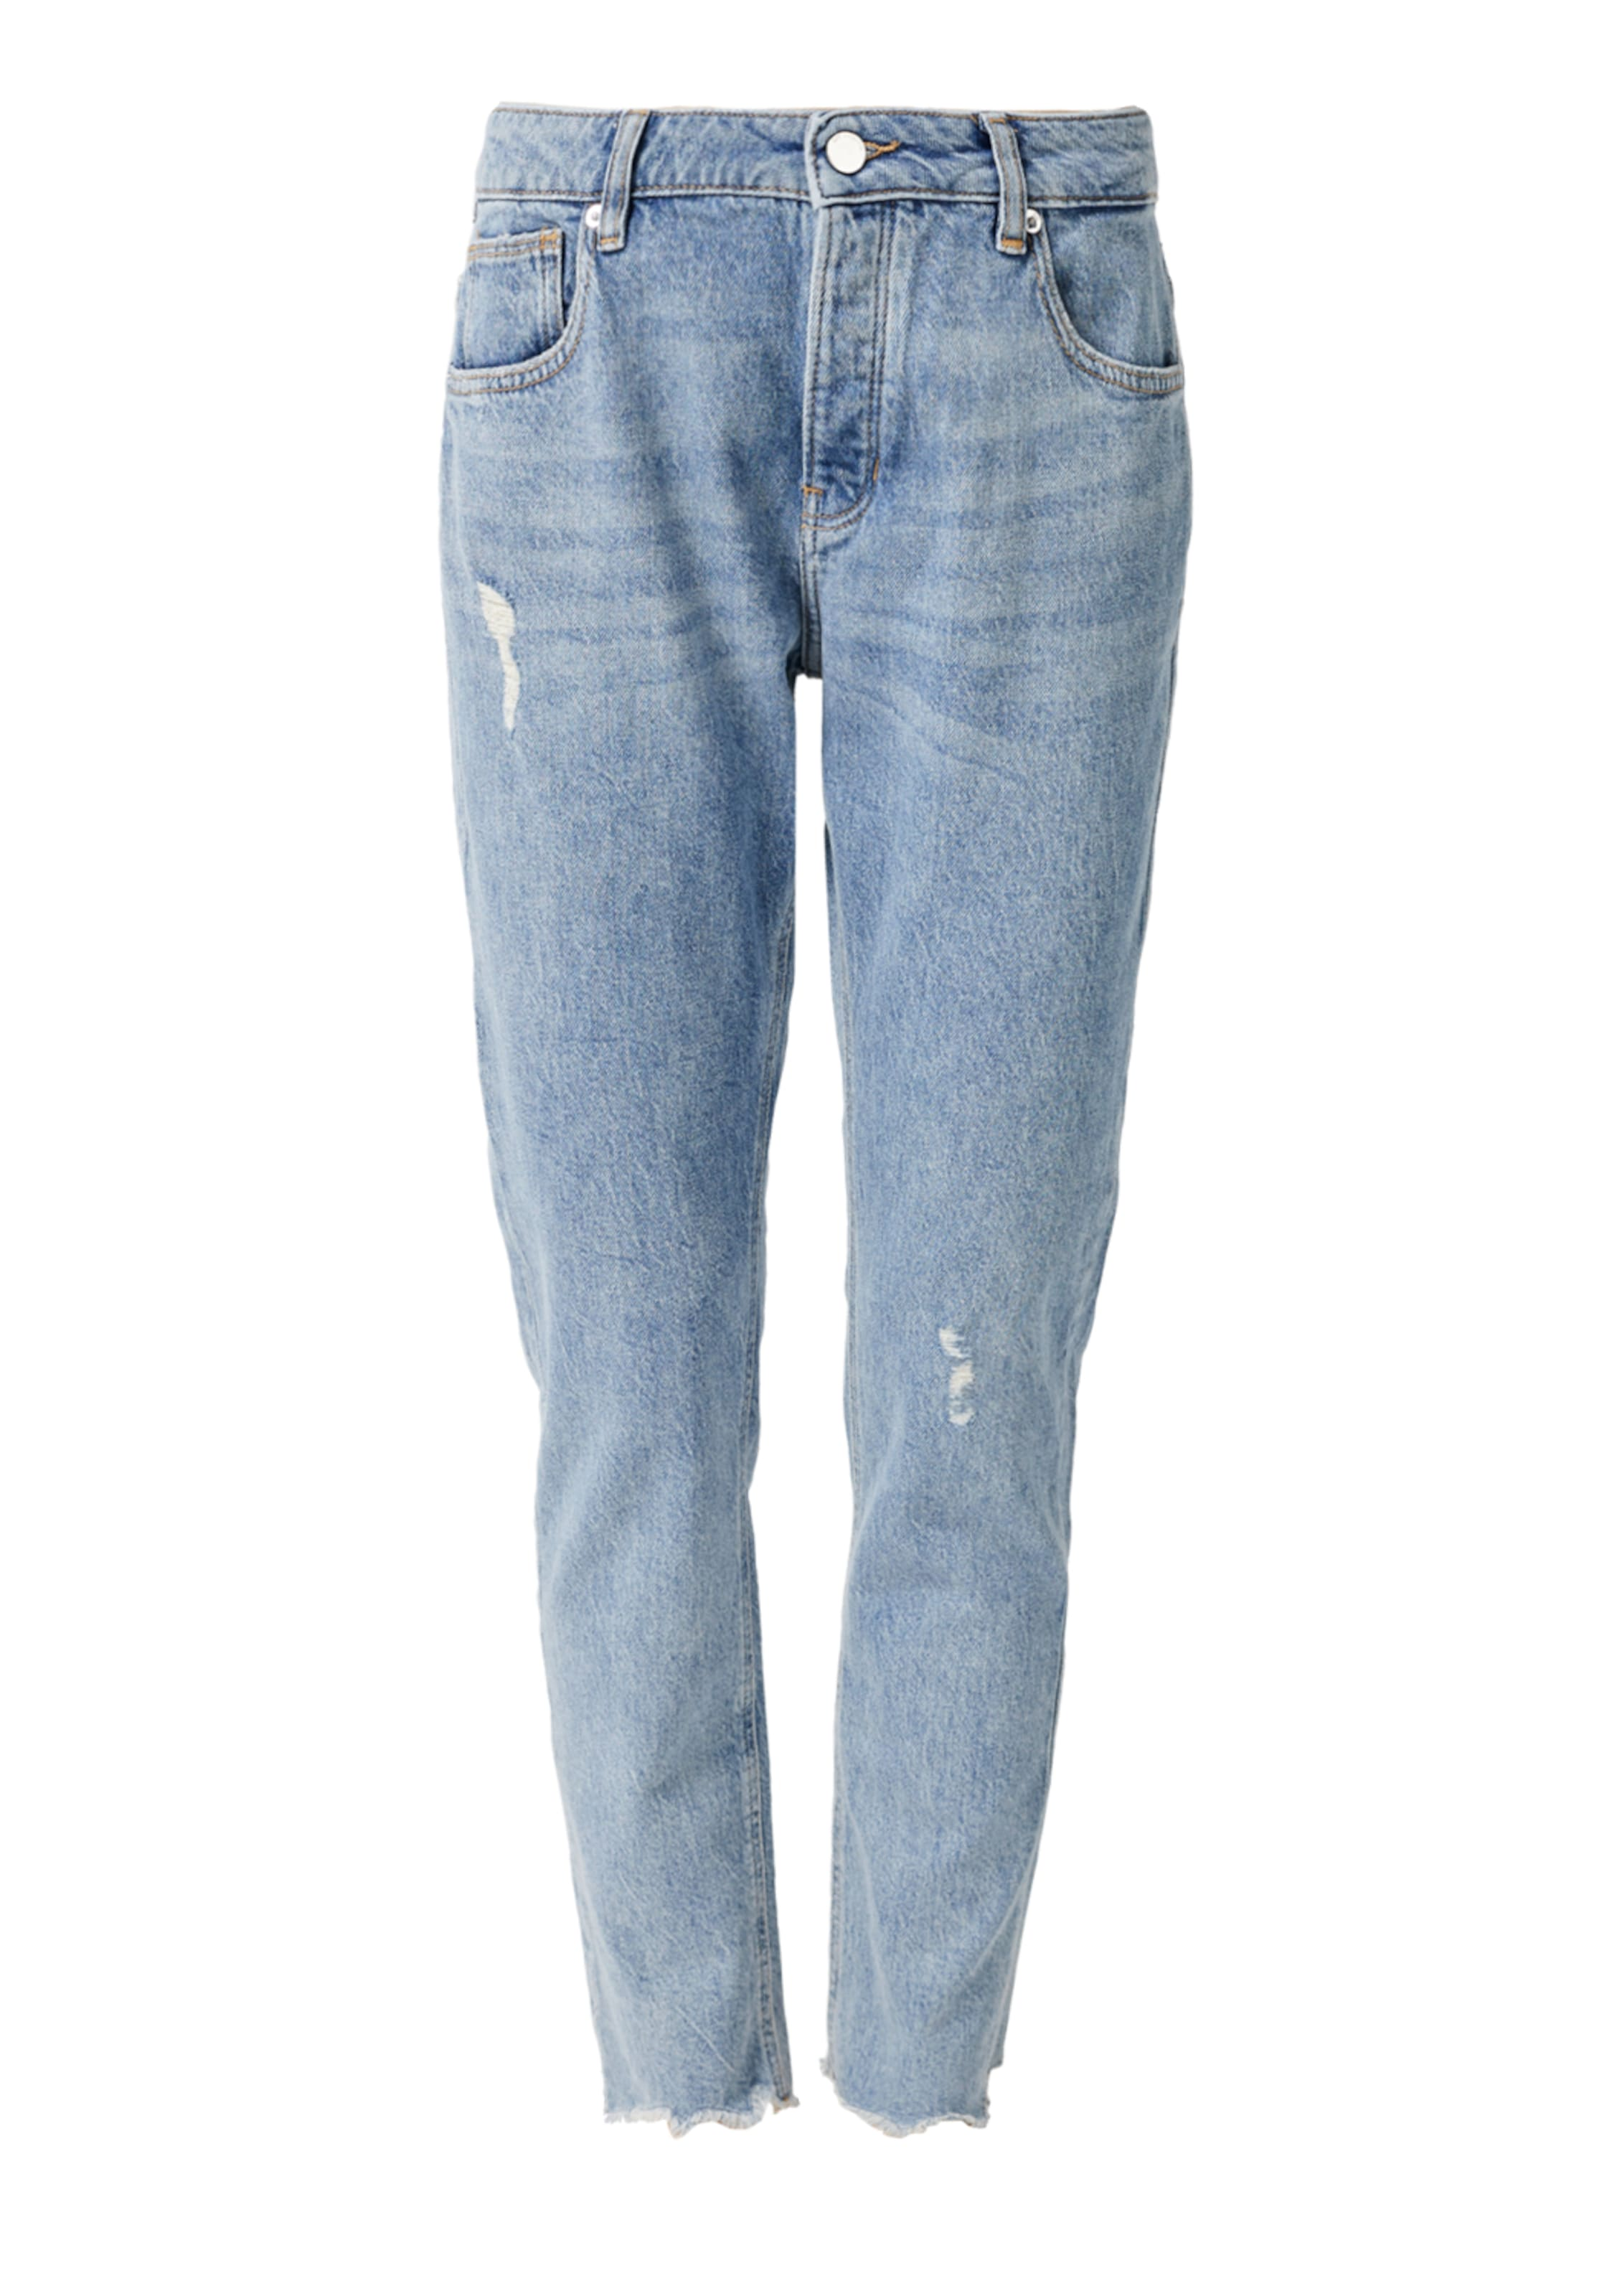 Girlfriend Q Designed 'megan' In By s Denim Jeans Blue fIbm7y6vYg